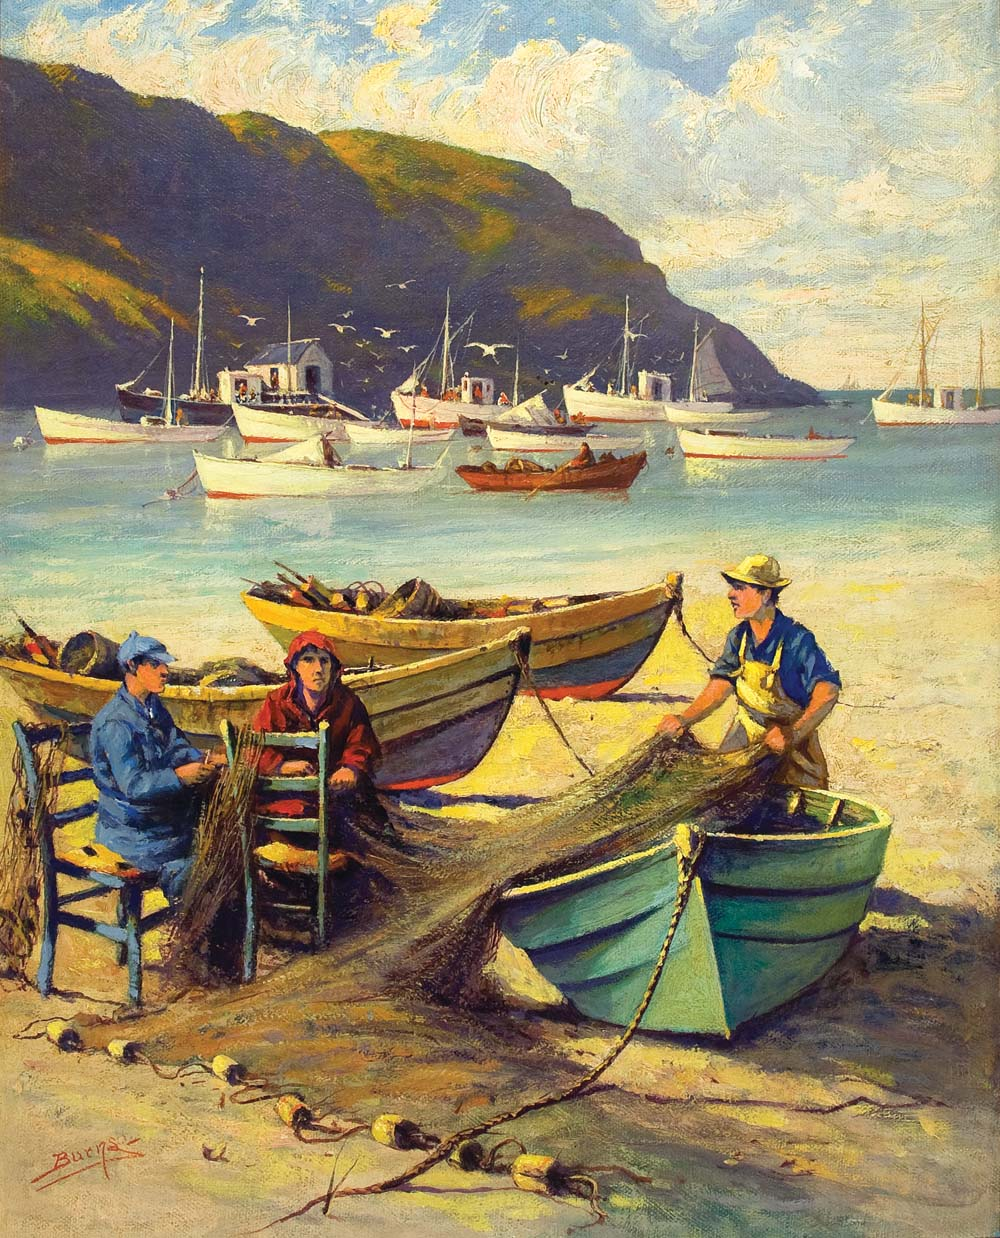 Milton J. Burns, Untitled (Mending Nets)